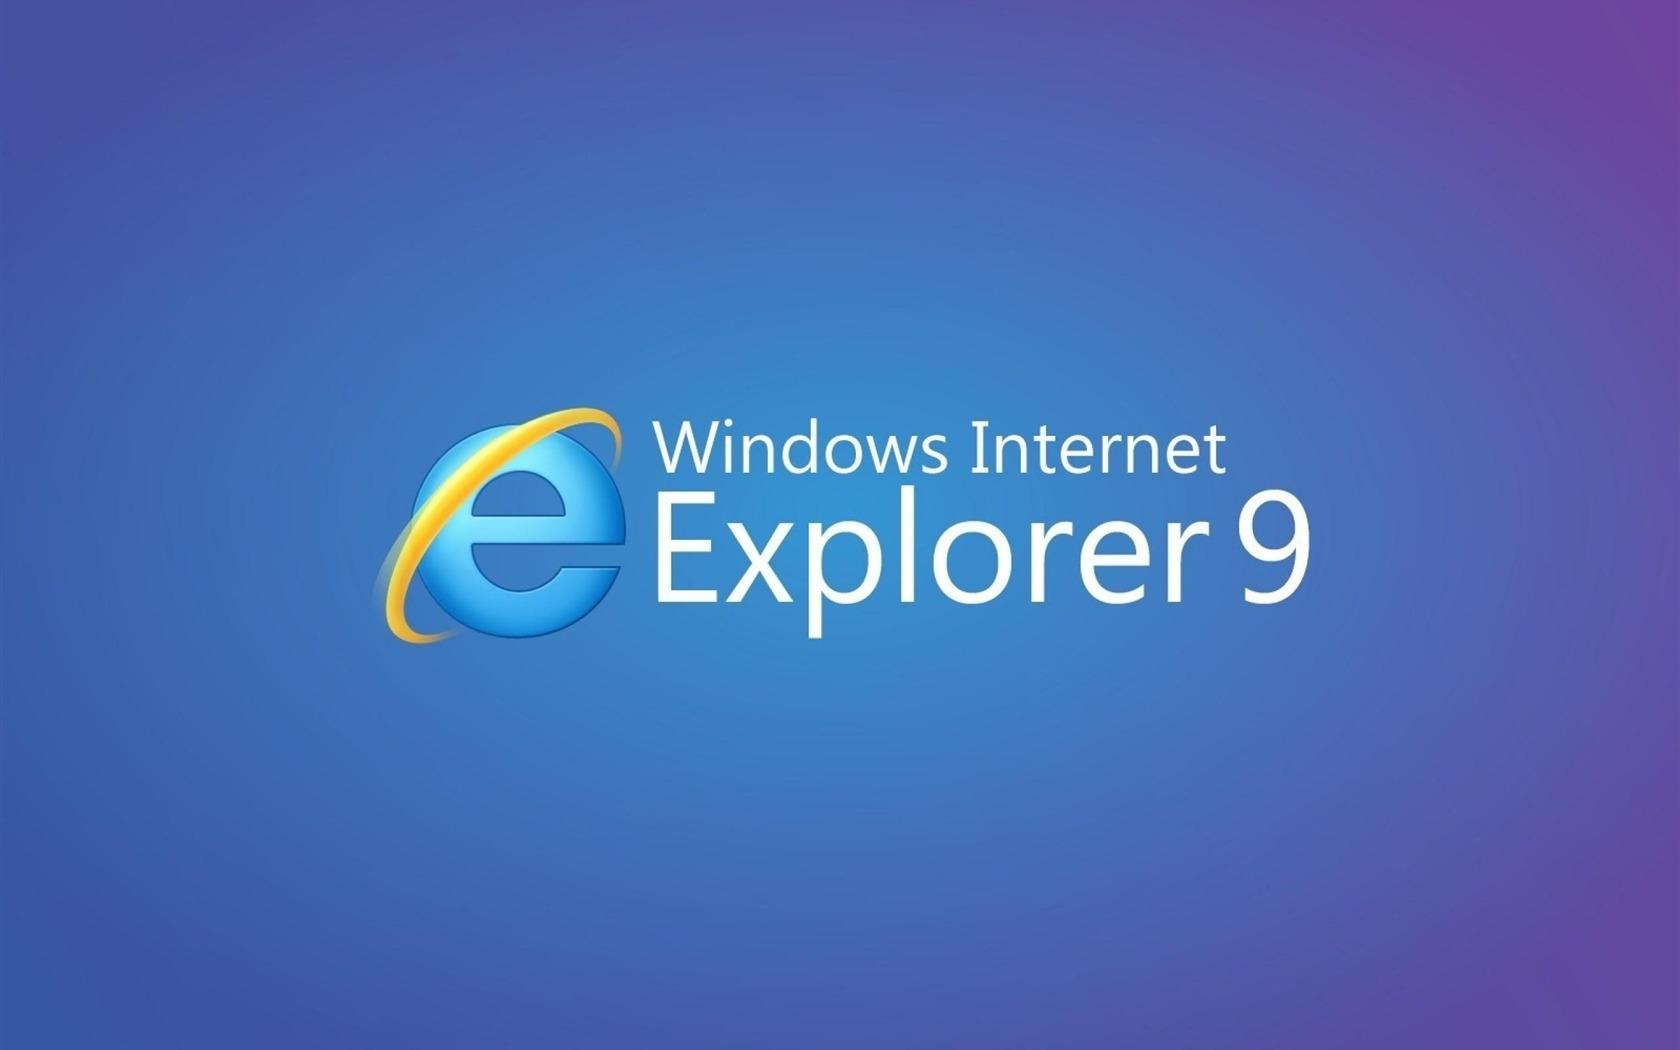 Internet Explorer 9 brand advertising wallpaper   1680x1050 wallpaper 1680x1050